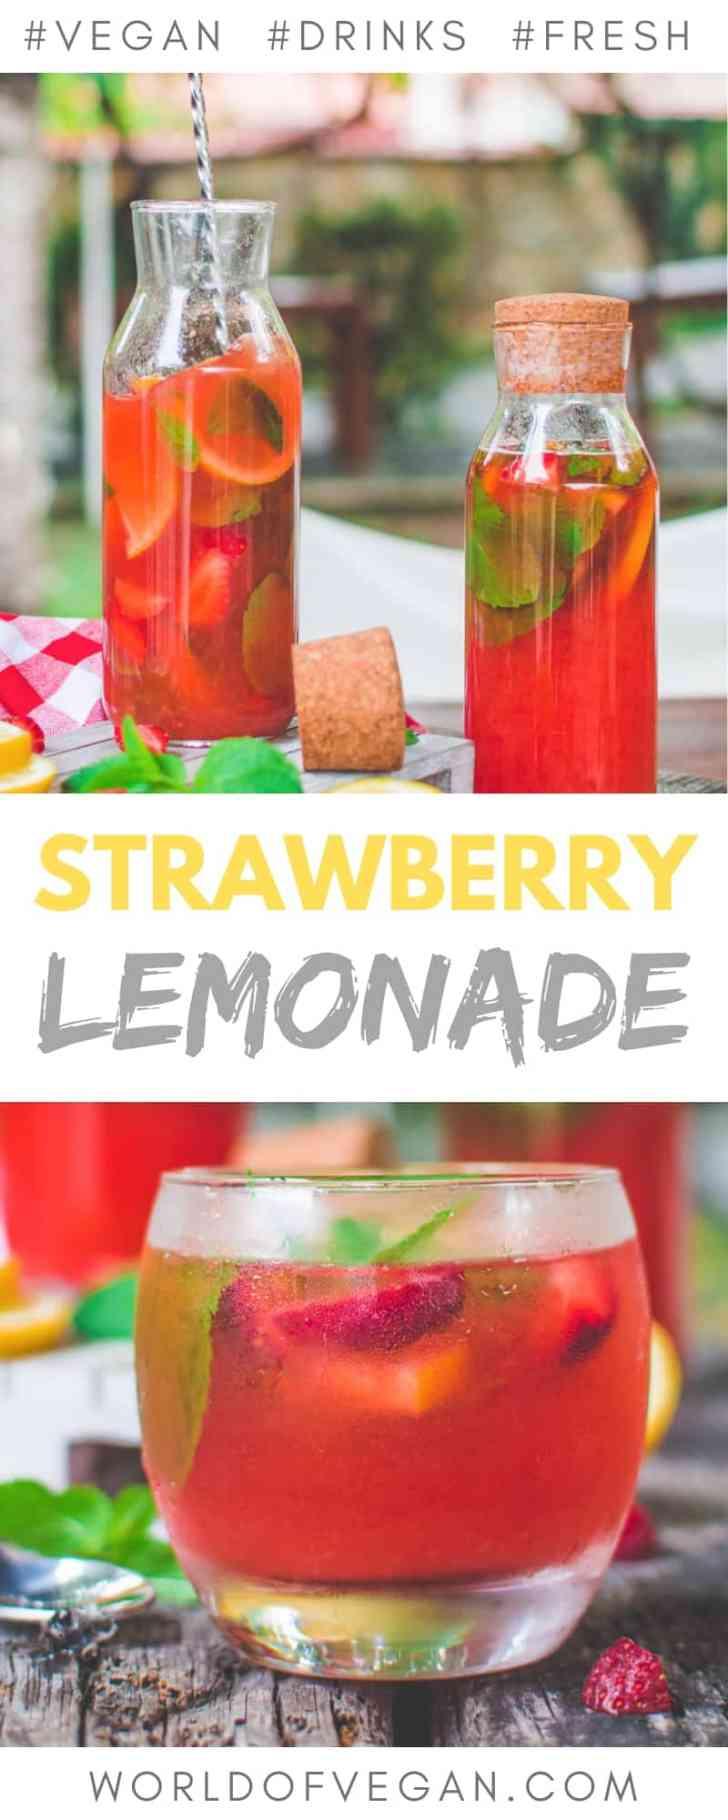 Fresh Strawberry Mint Lemonade   World of Vegan   #lemonade #strawberries #lemon #mint #fresh #drink #water #fruits #worldofvegan